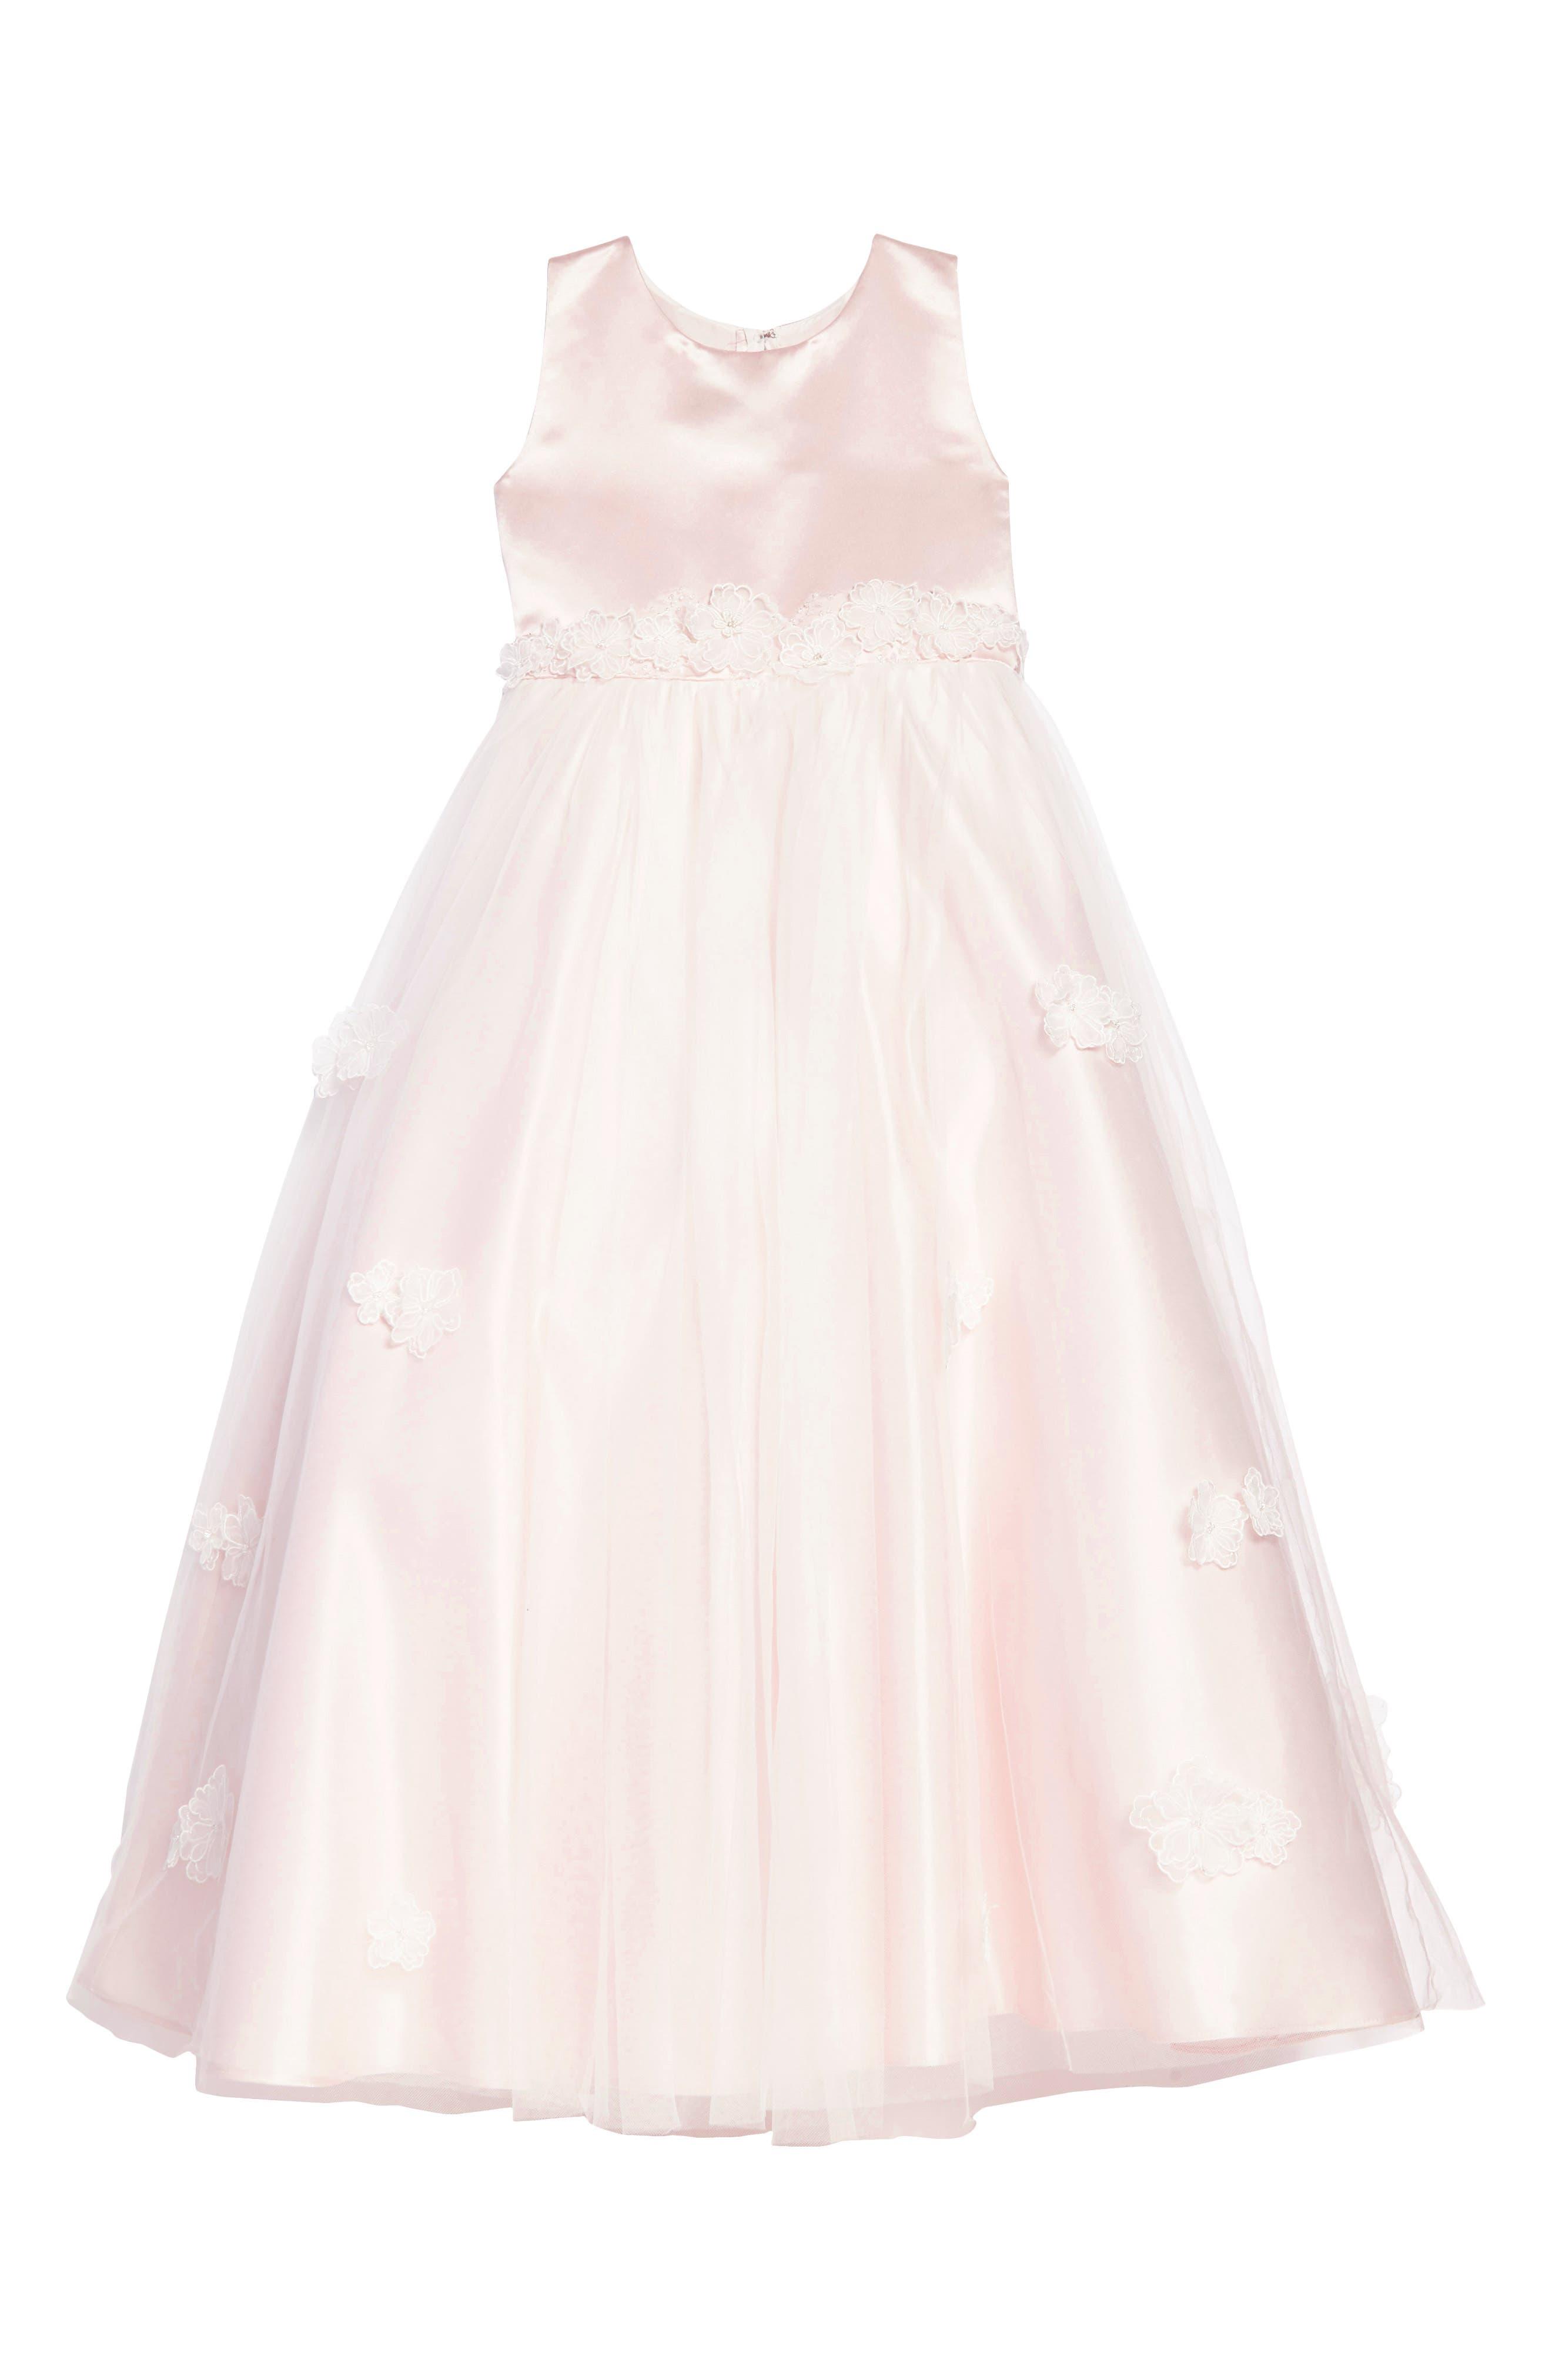 Satin & Tulle Dress,                             Main thumbnail 1, color,                             900